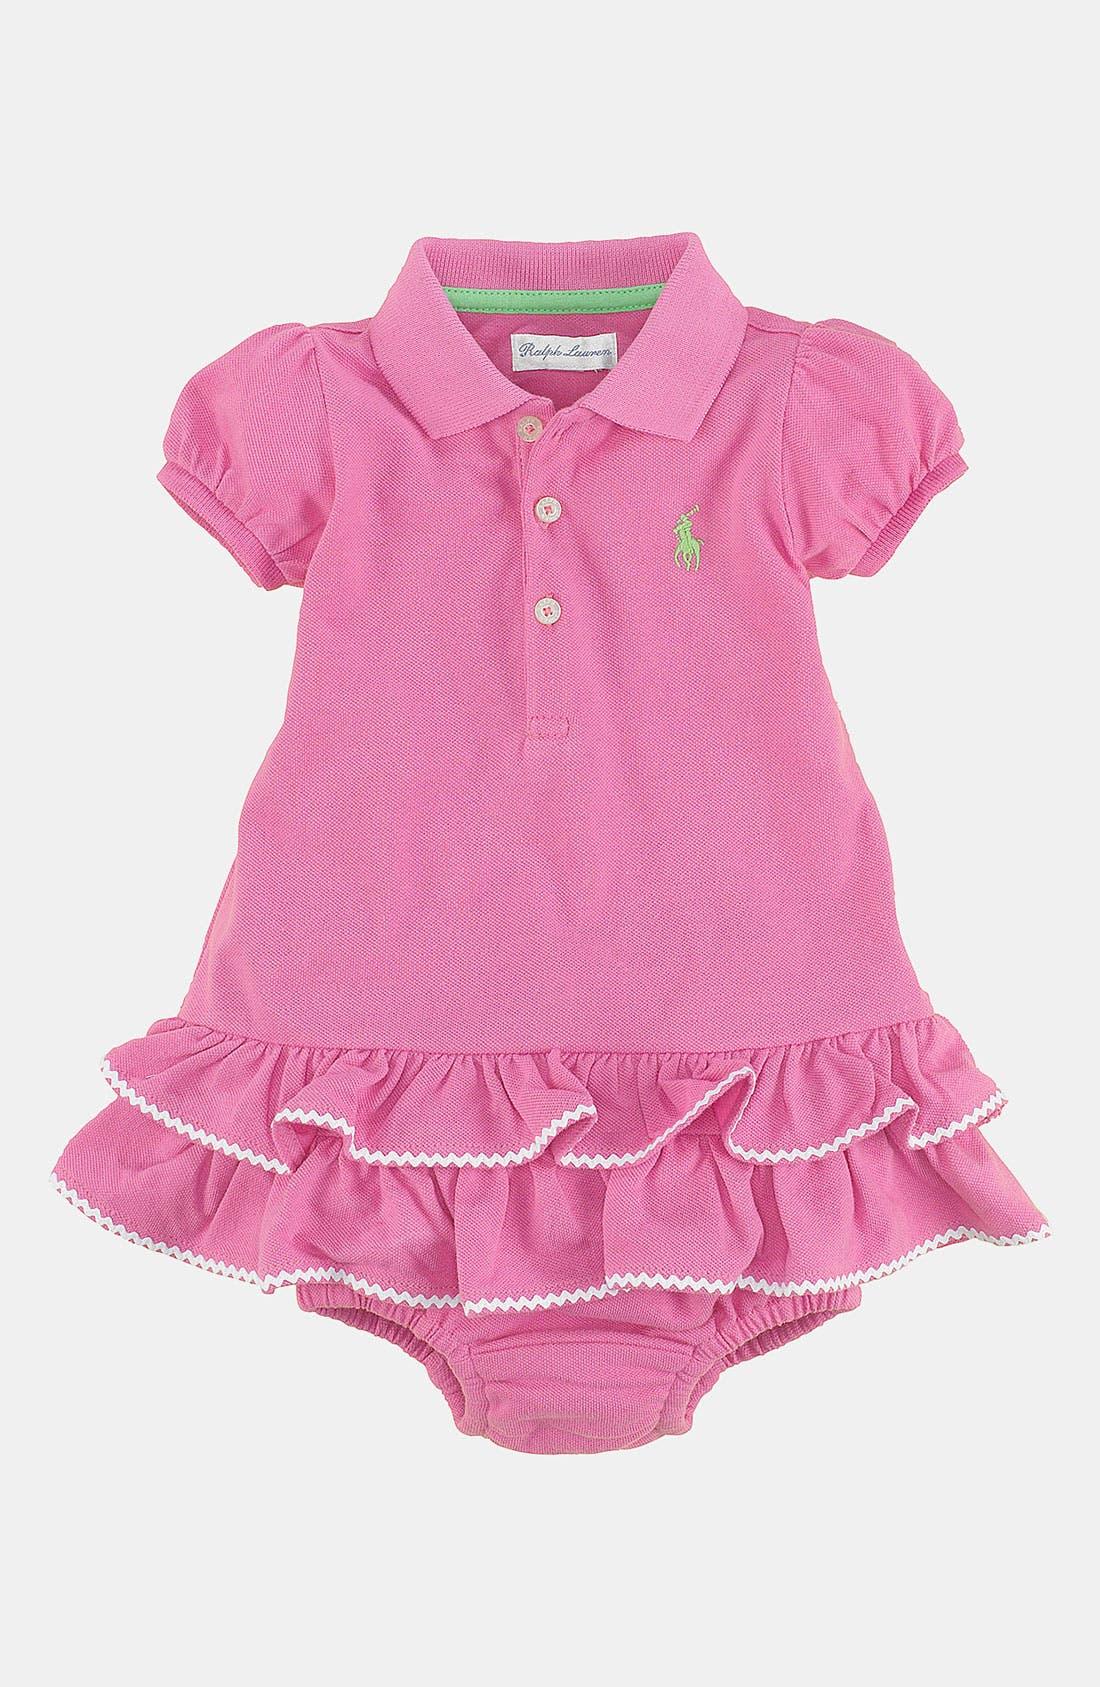 Main Image - Ralph Lauren Rickrack Polo Dress & Bloomers (Baby)